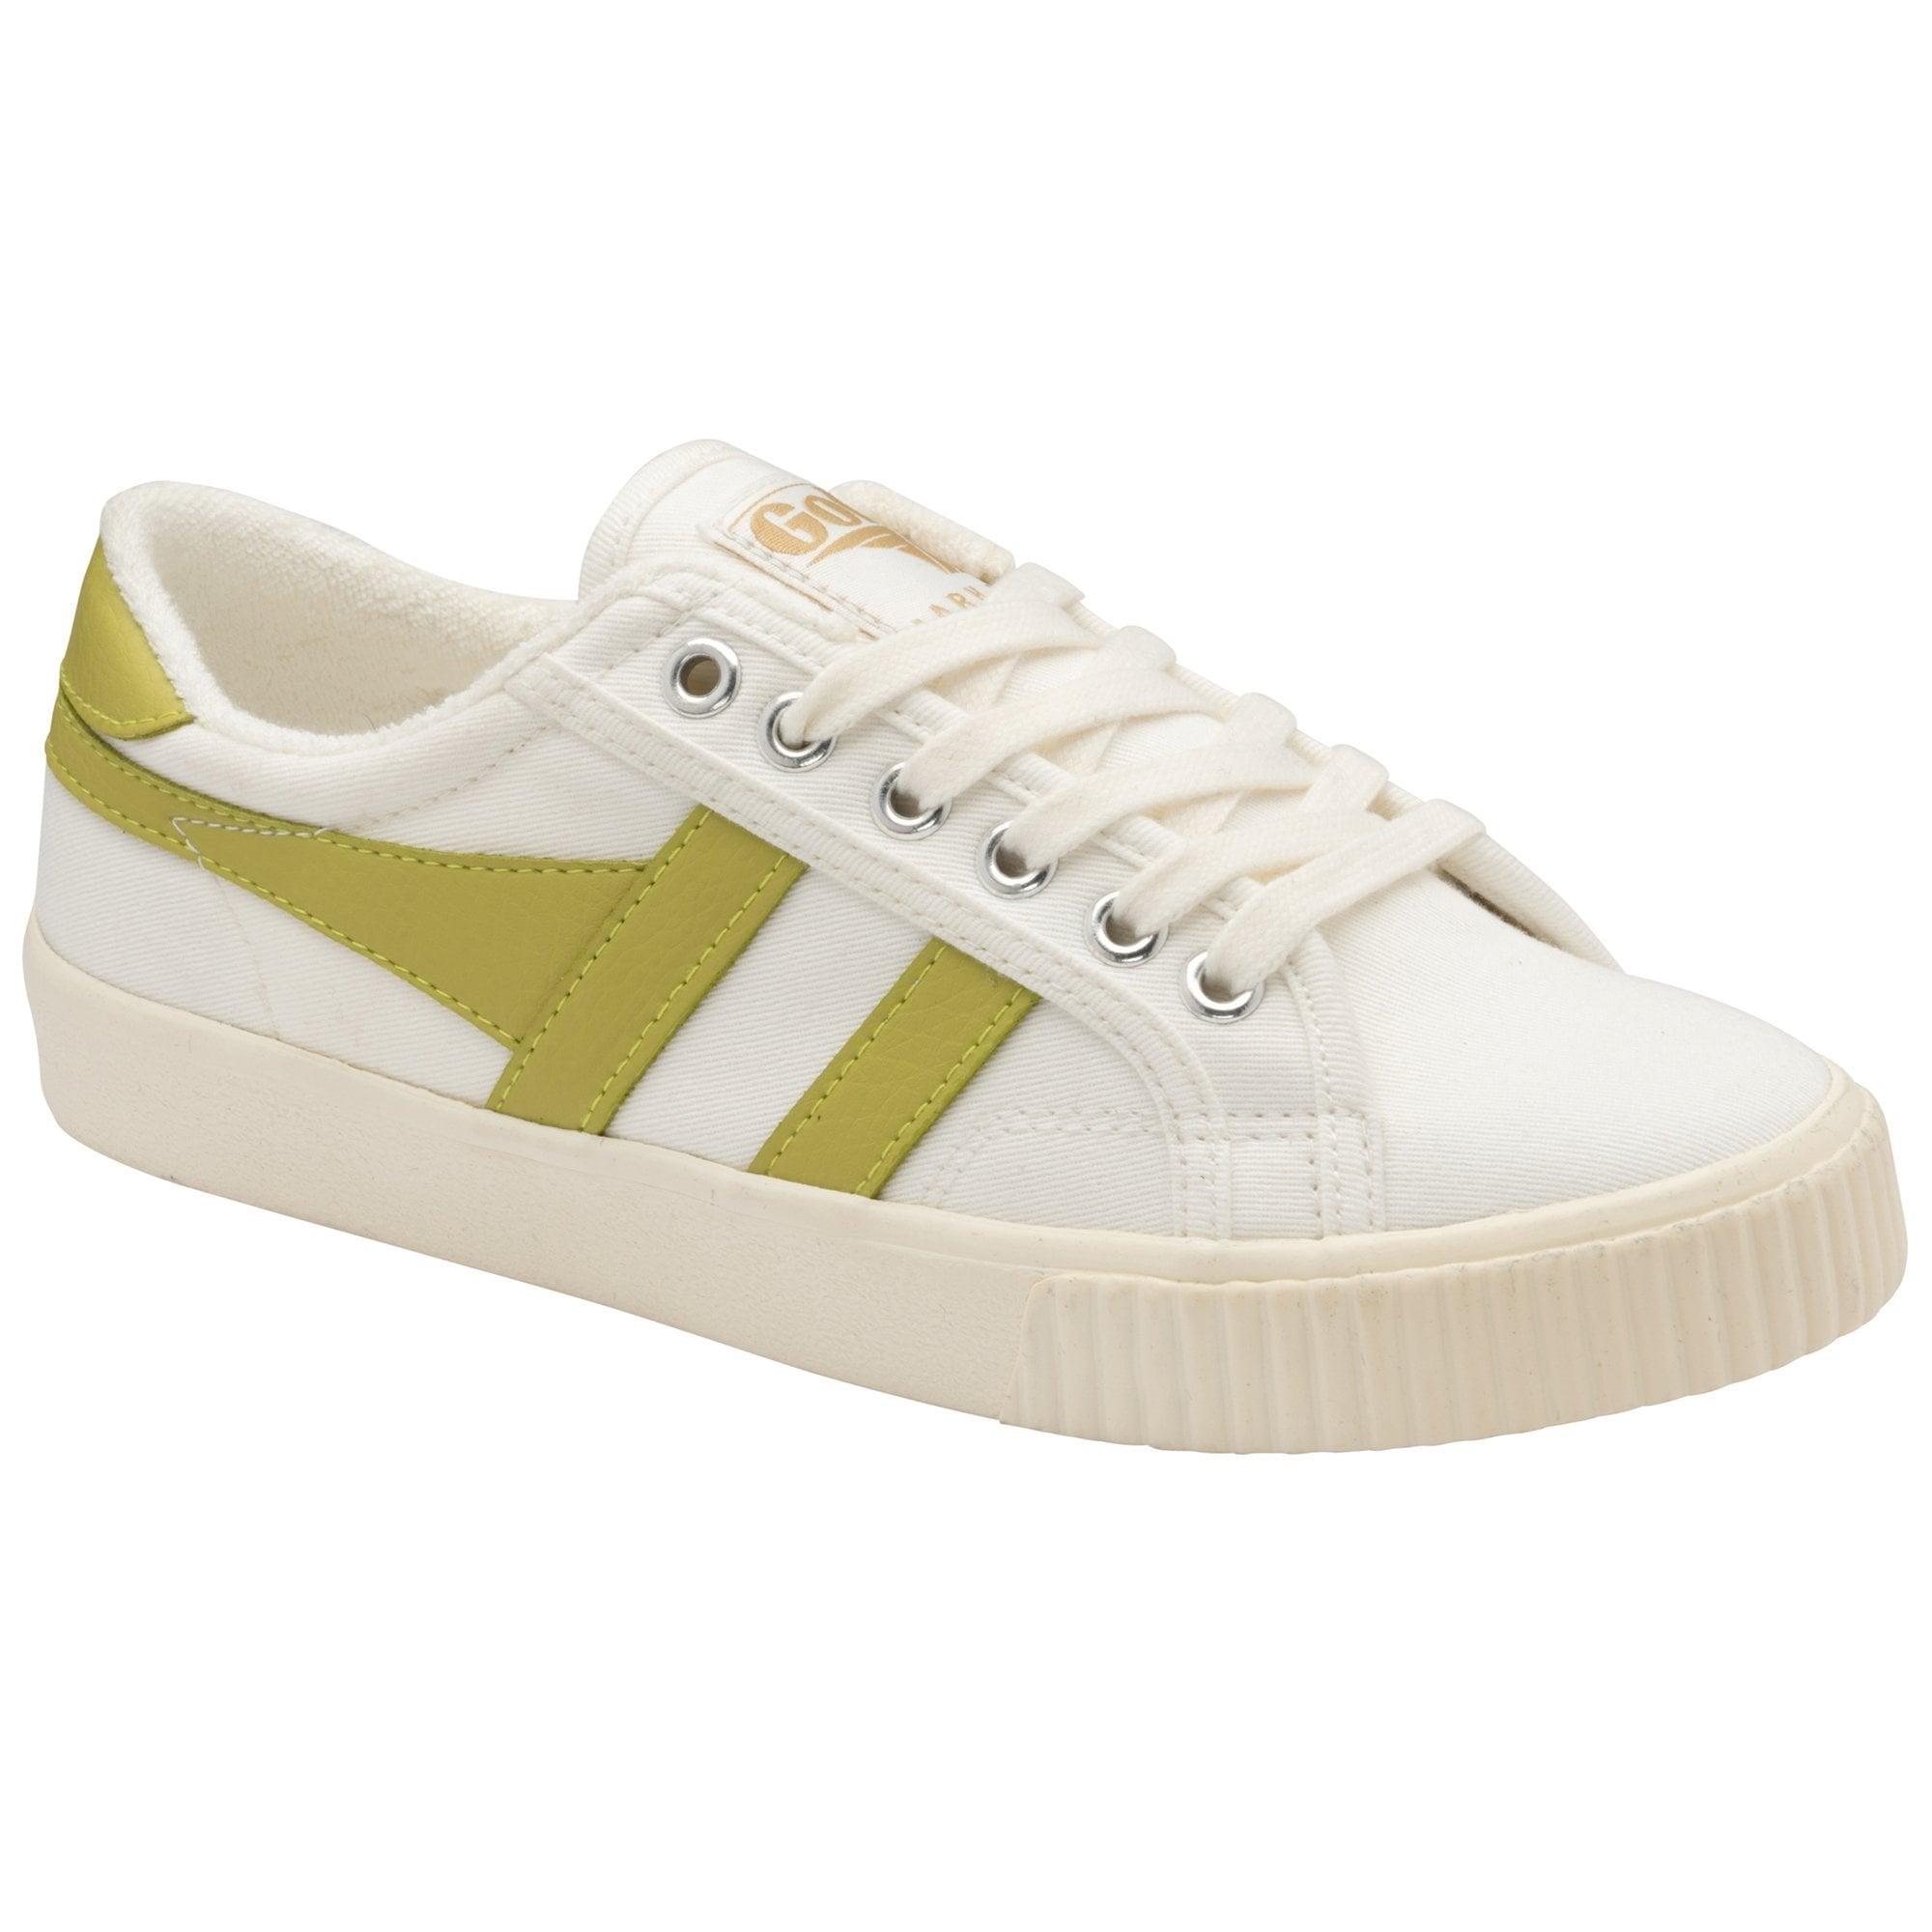 Gola womens Tennis Mark Cox sneakers